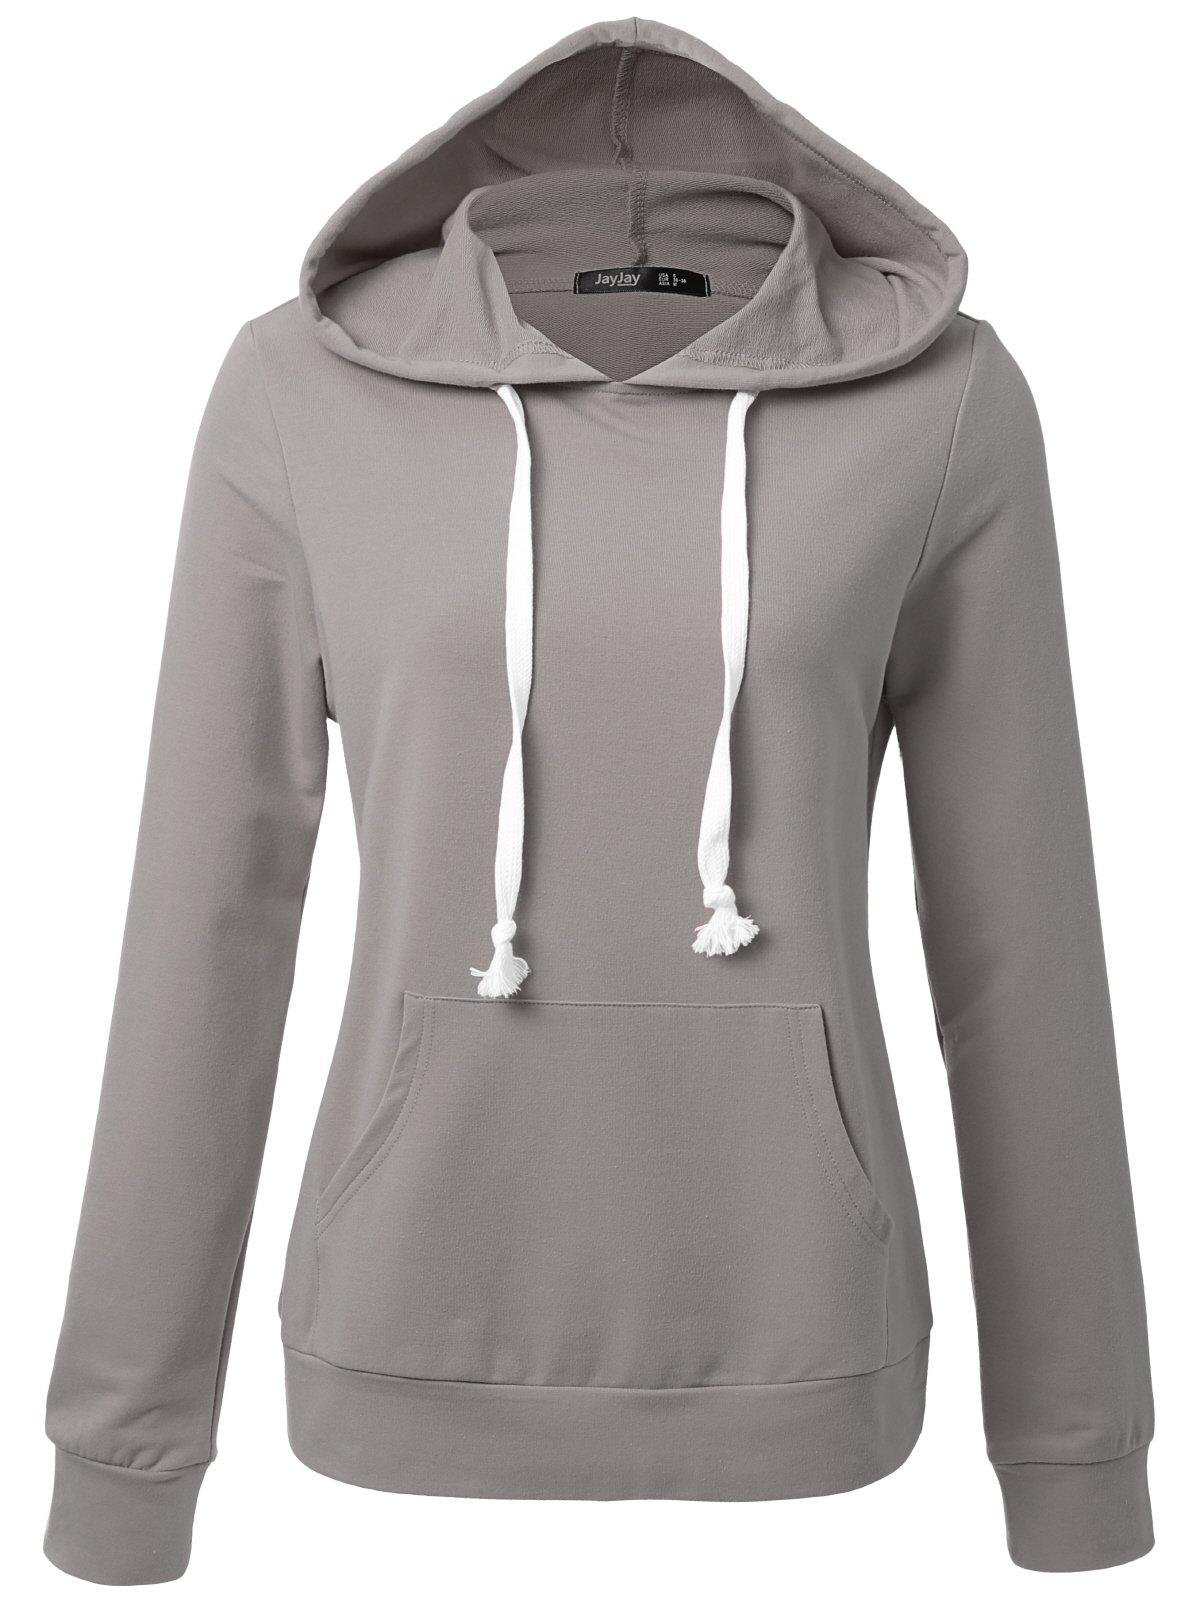 JayJay Women Long Sleeve Lightweight Casual Pullover Hoodie Sweatshirts With Kangaroo Pocket,MISTGRAY,2XL